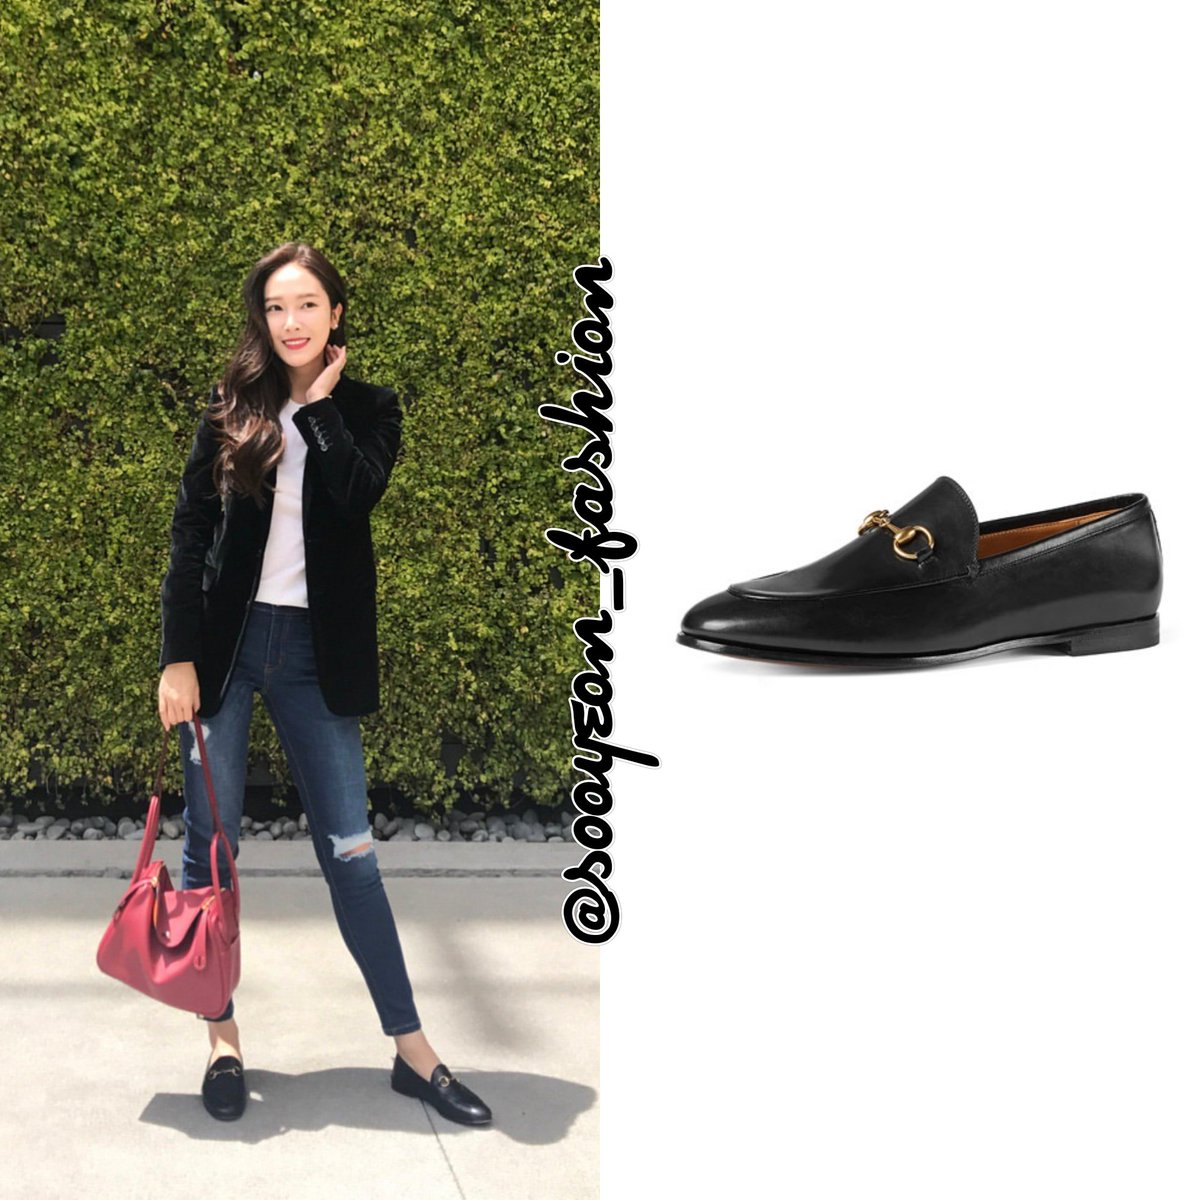 f678b0dd9 ... Leather Loafer (Black), $695 https://www.gucci.com/us/en/pr/women/womens -shoes/womens-moccasins-loafers/gucci-jordaan-leather-loafer-p-404069BLM001000  …